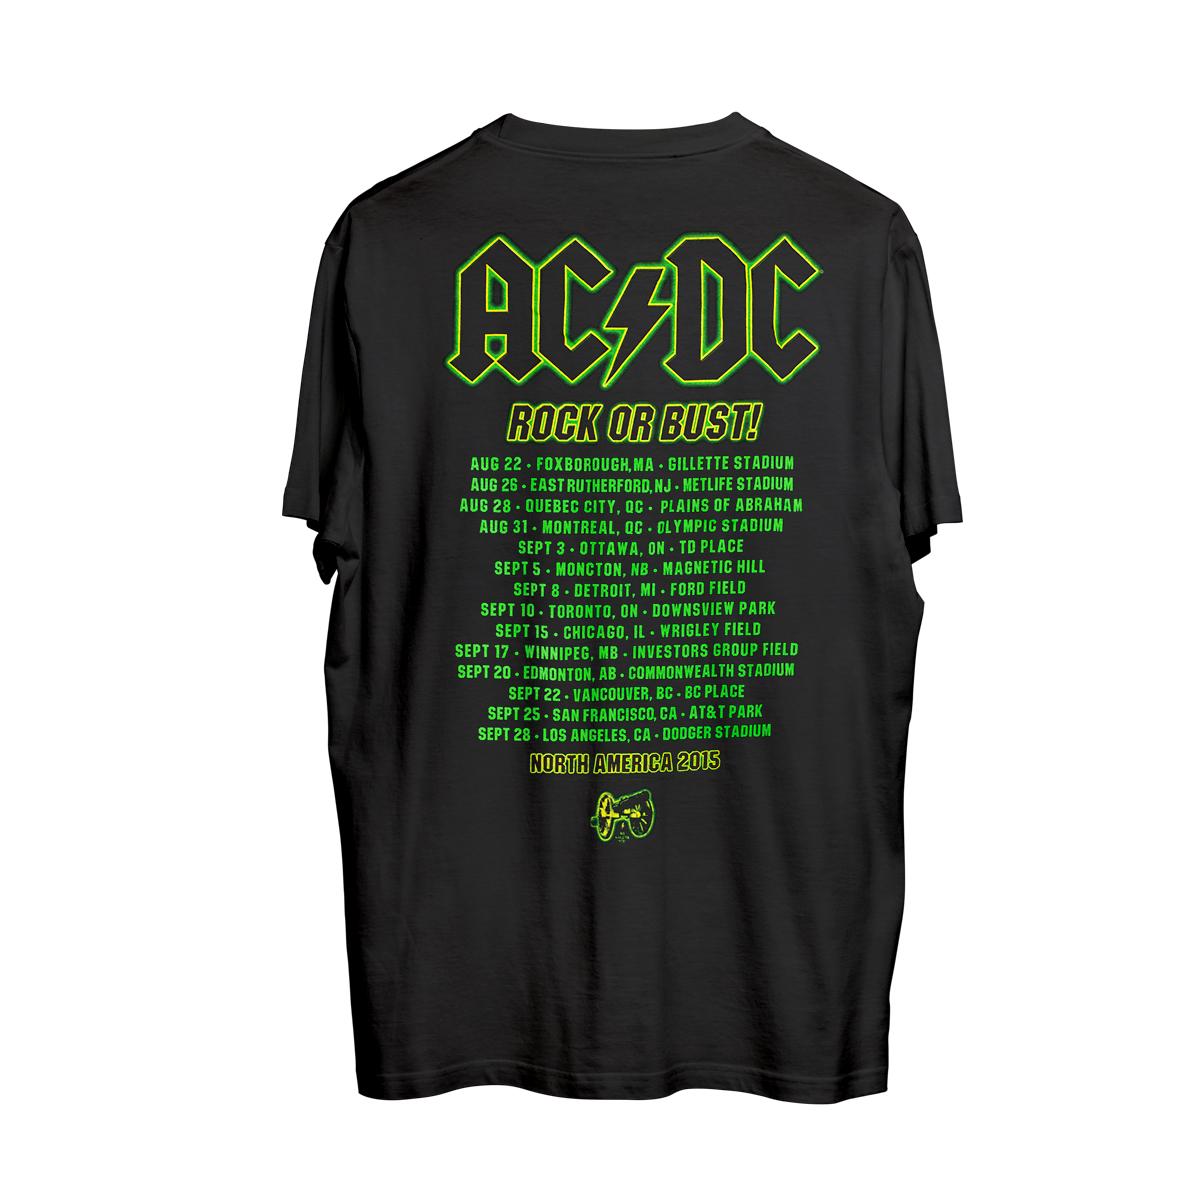 AC/DC Black LIVE 2015 dates T-shirt